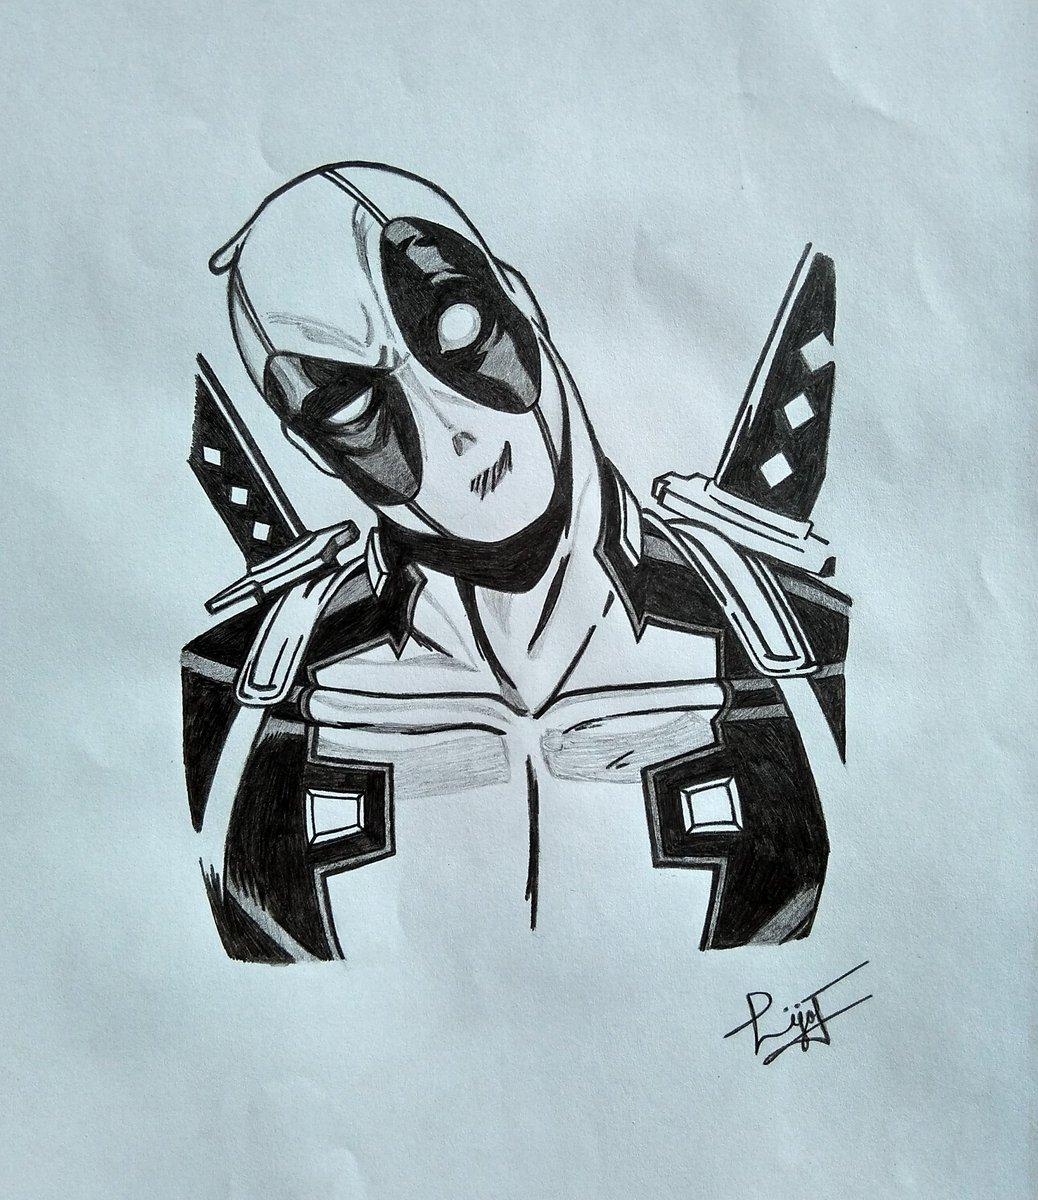 Lijo john on twitter deadpools pencil sketch made by me on a4